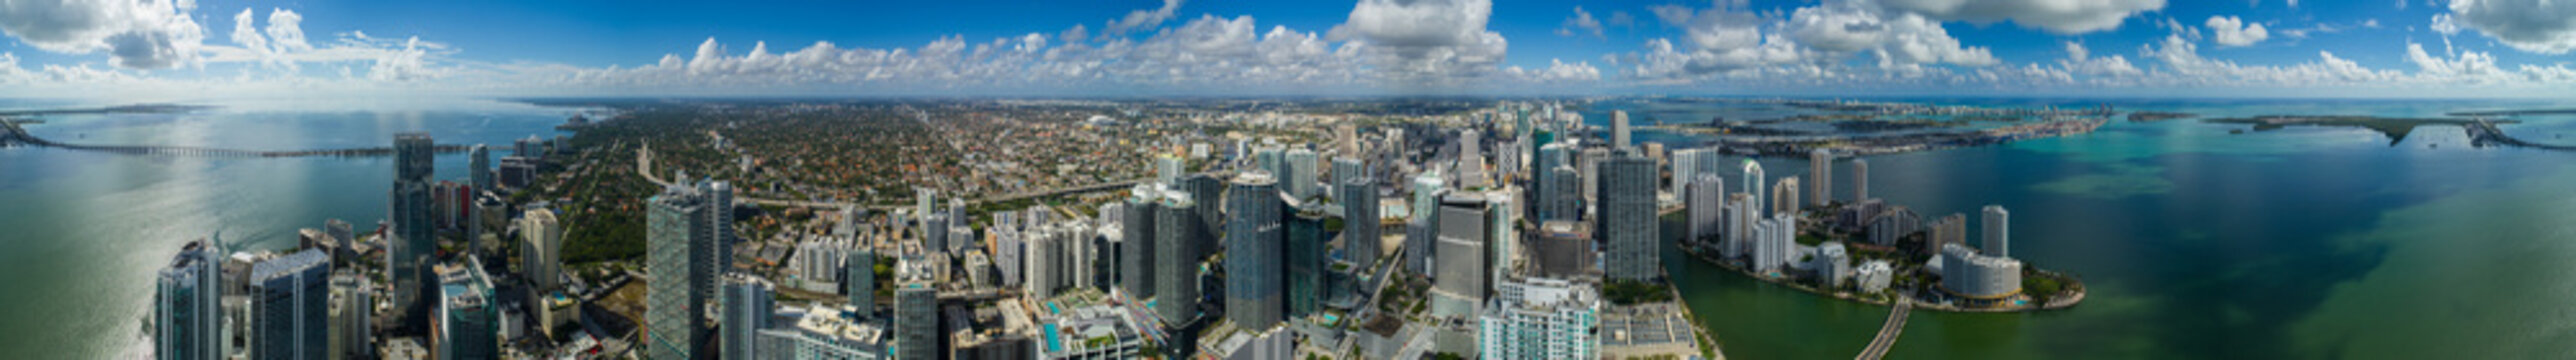 Amazing aerial Brickell Miami Florida large scale